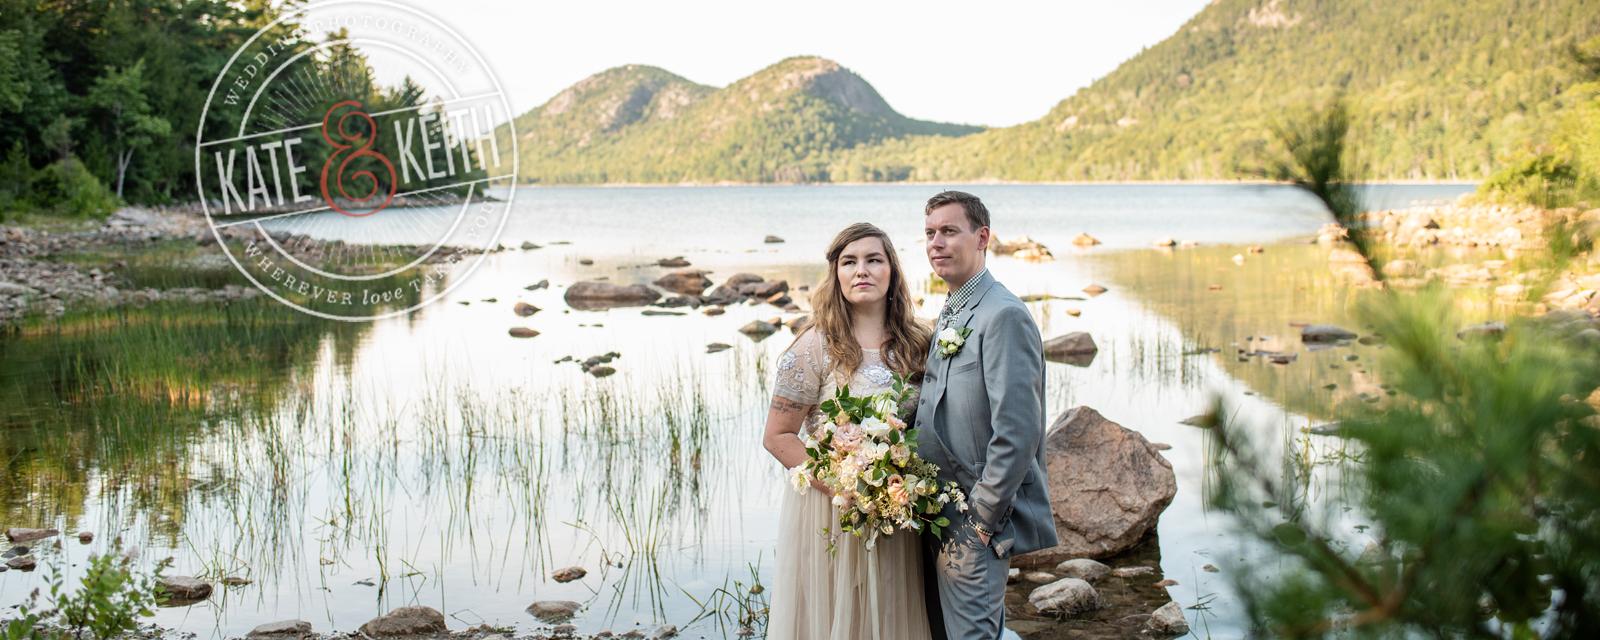 Jordan Pond Wedding